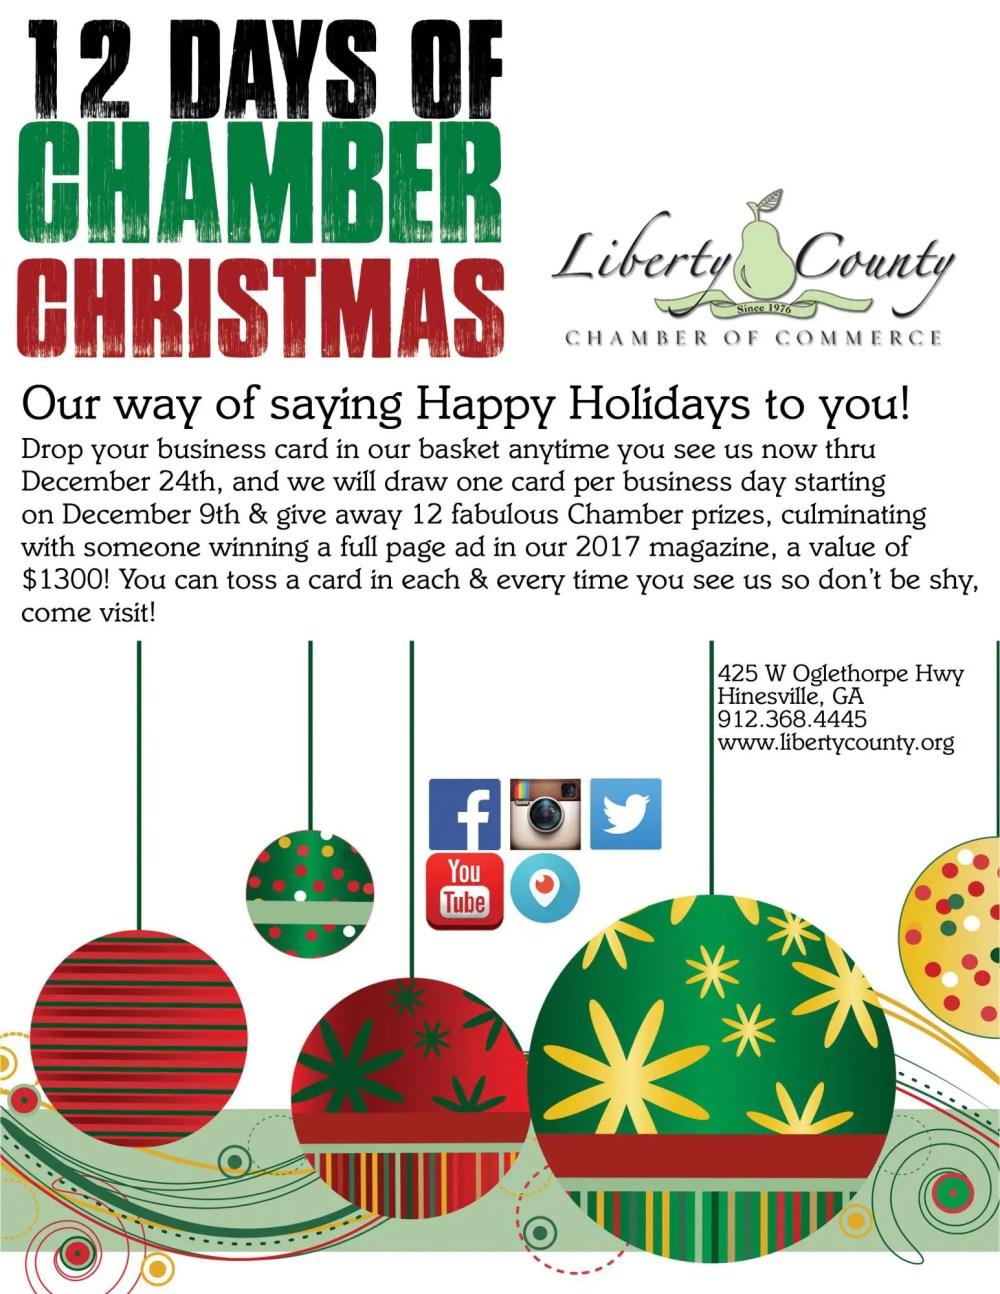 medium resolution of 12 days of chamber christmas